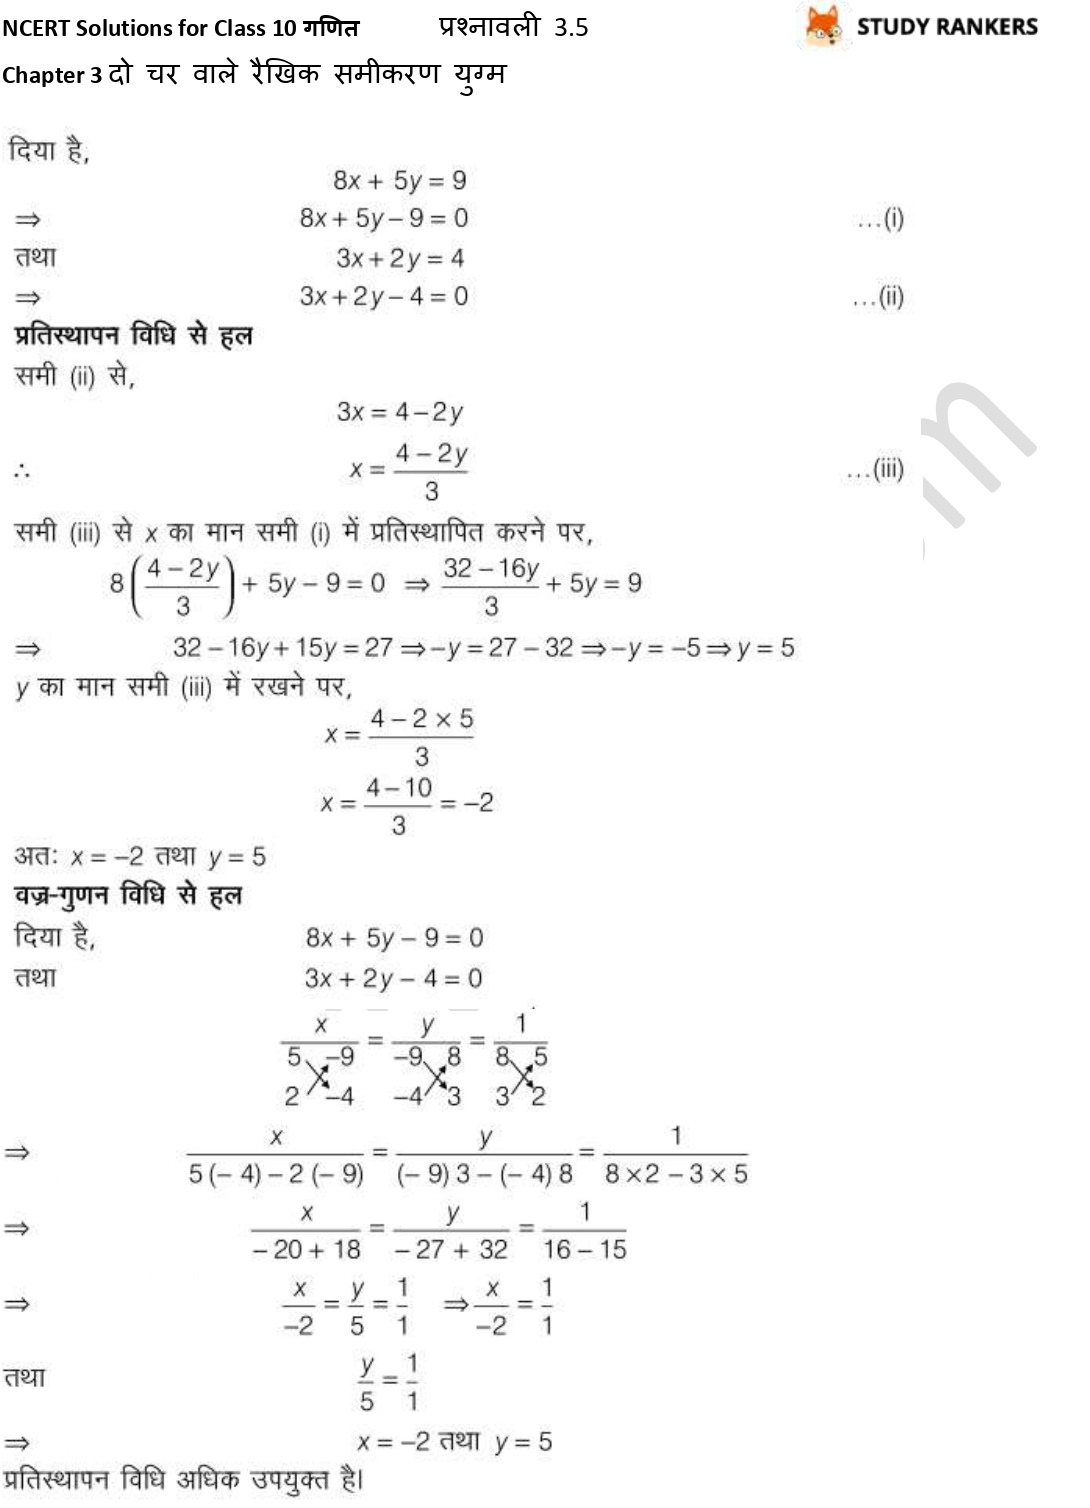 NCERT Solutions for Class 10 Maths Chapter 3 दो चर वाले रैखिक समीकरण युग्म प्रश्नावली 3.5 Part 6